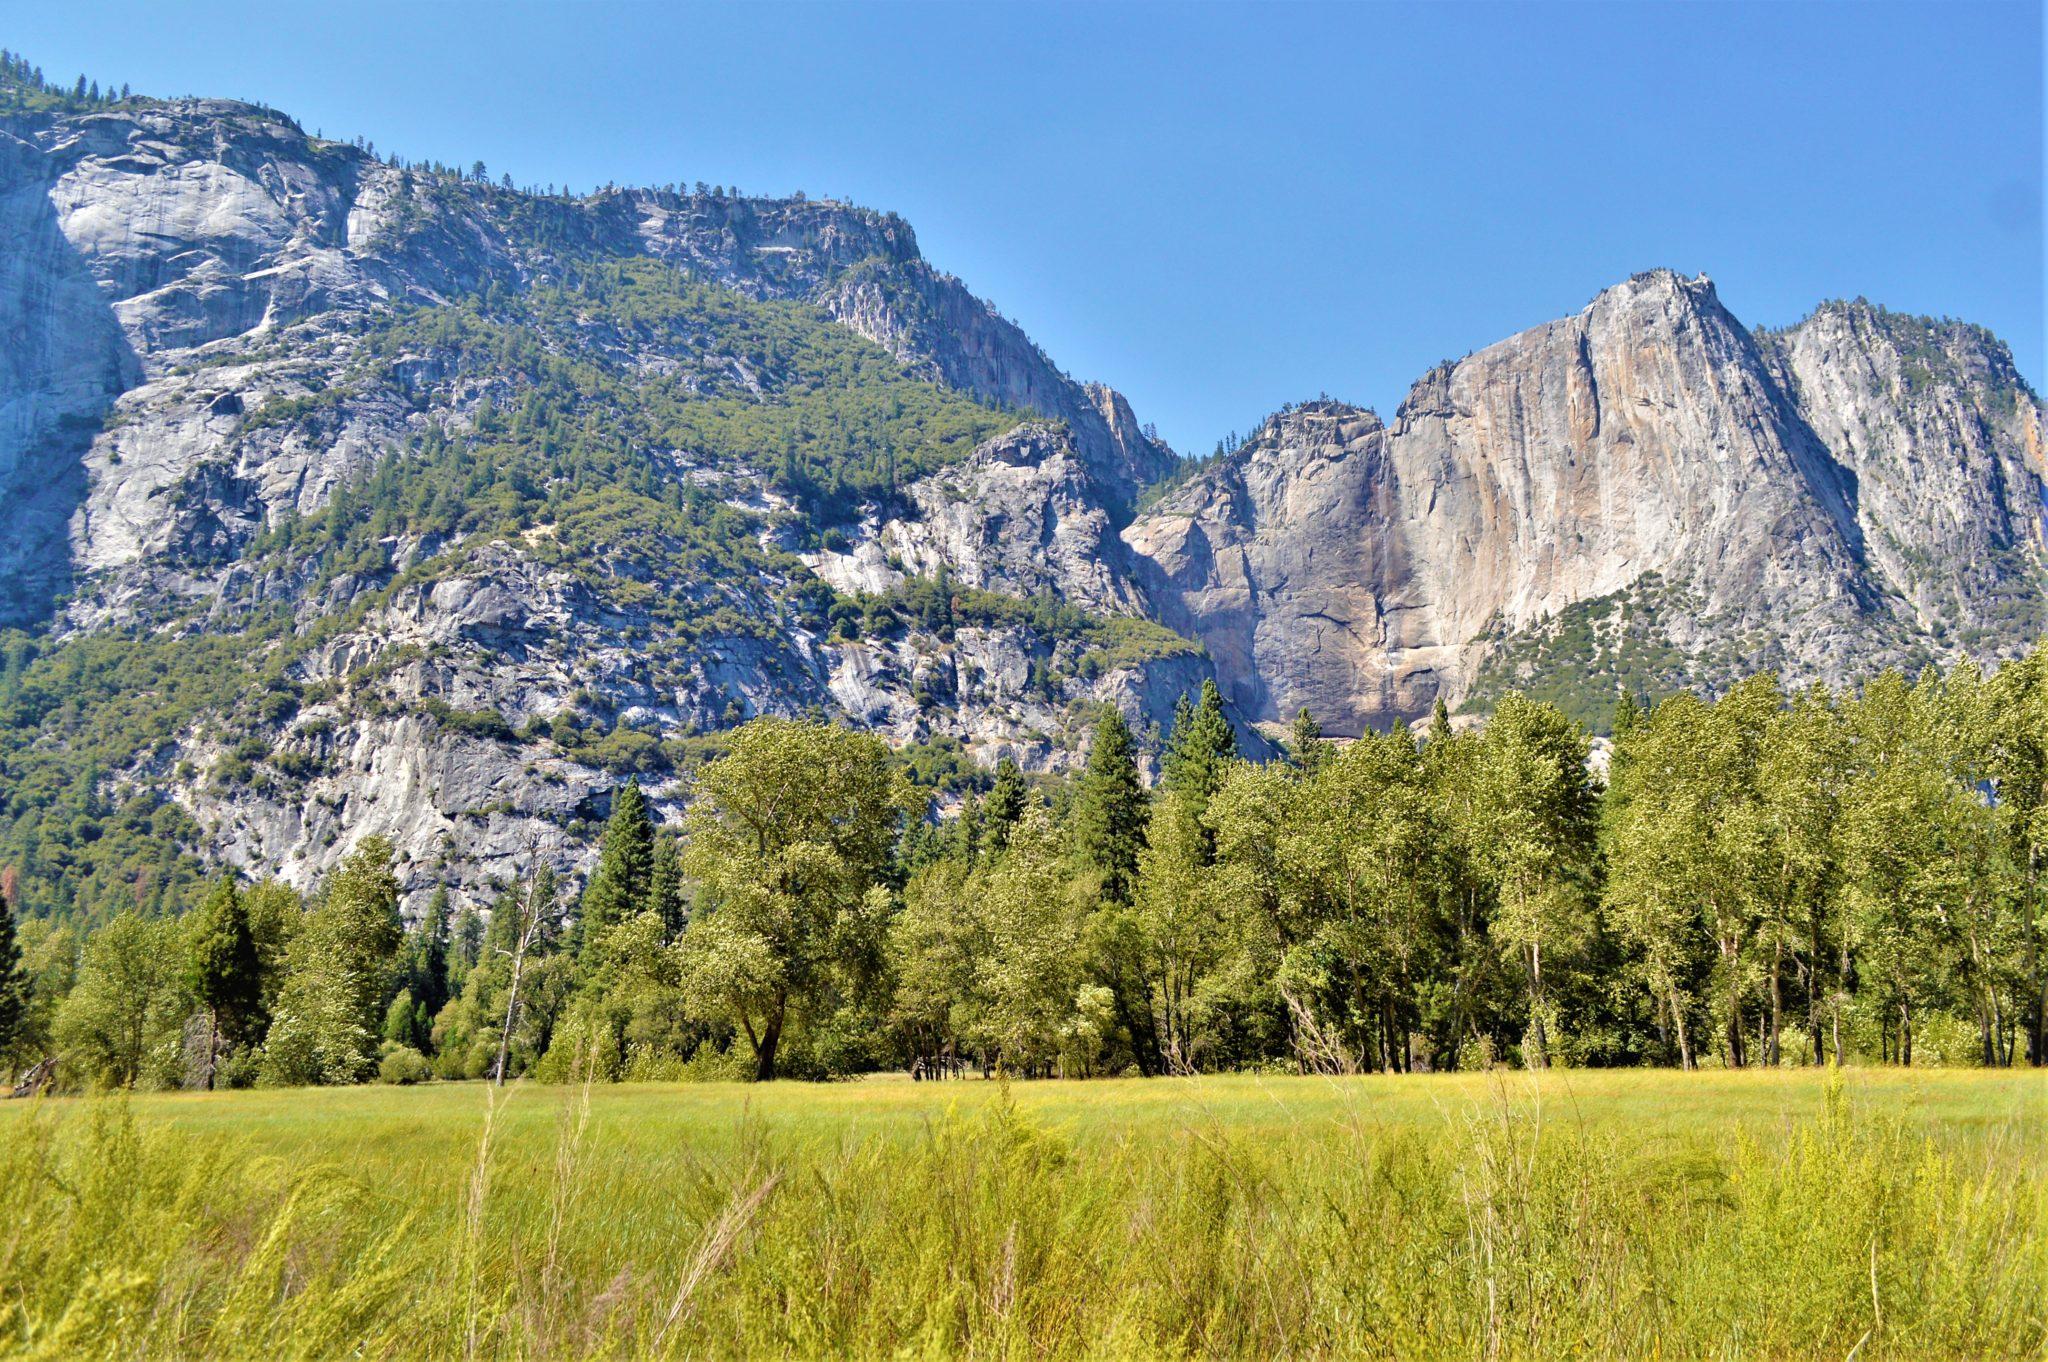 Meadows, Yosemite National Park, California, things to do at yosemite